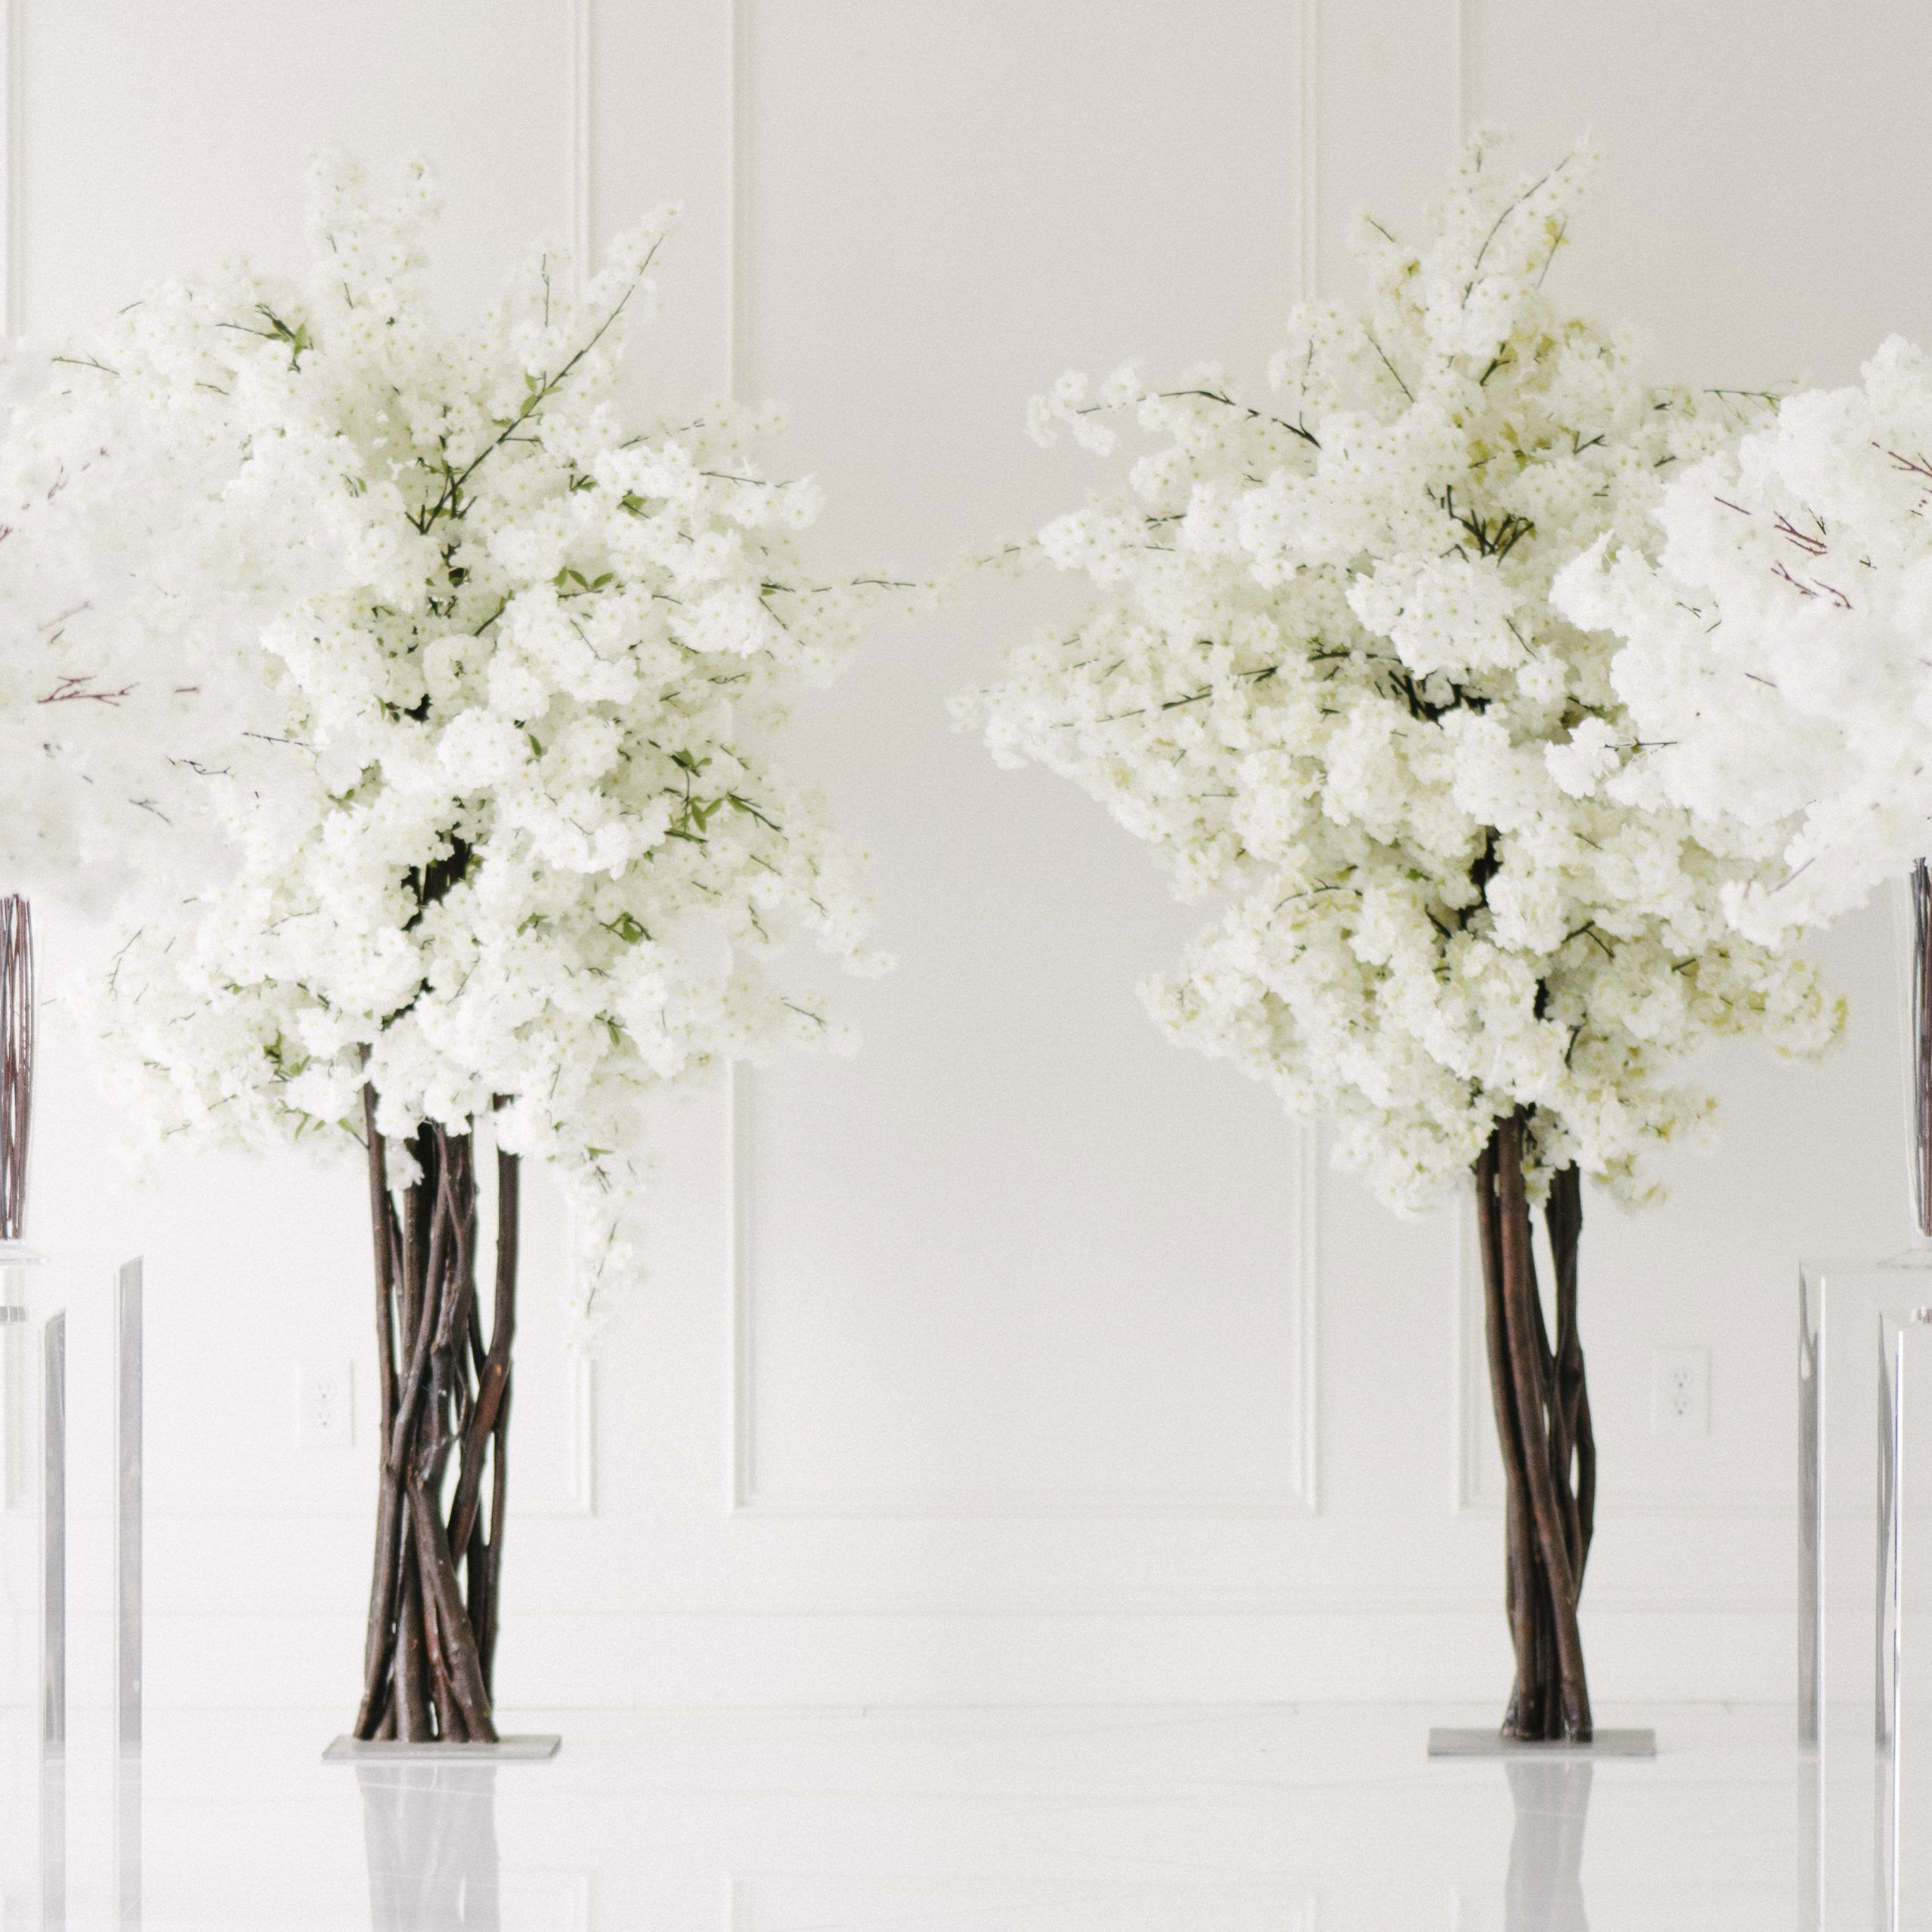 Dulce White Blossom Tree Rental Vintagebash White Blossom Tree Blossom Trees White Cherry Blossom